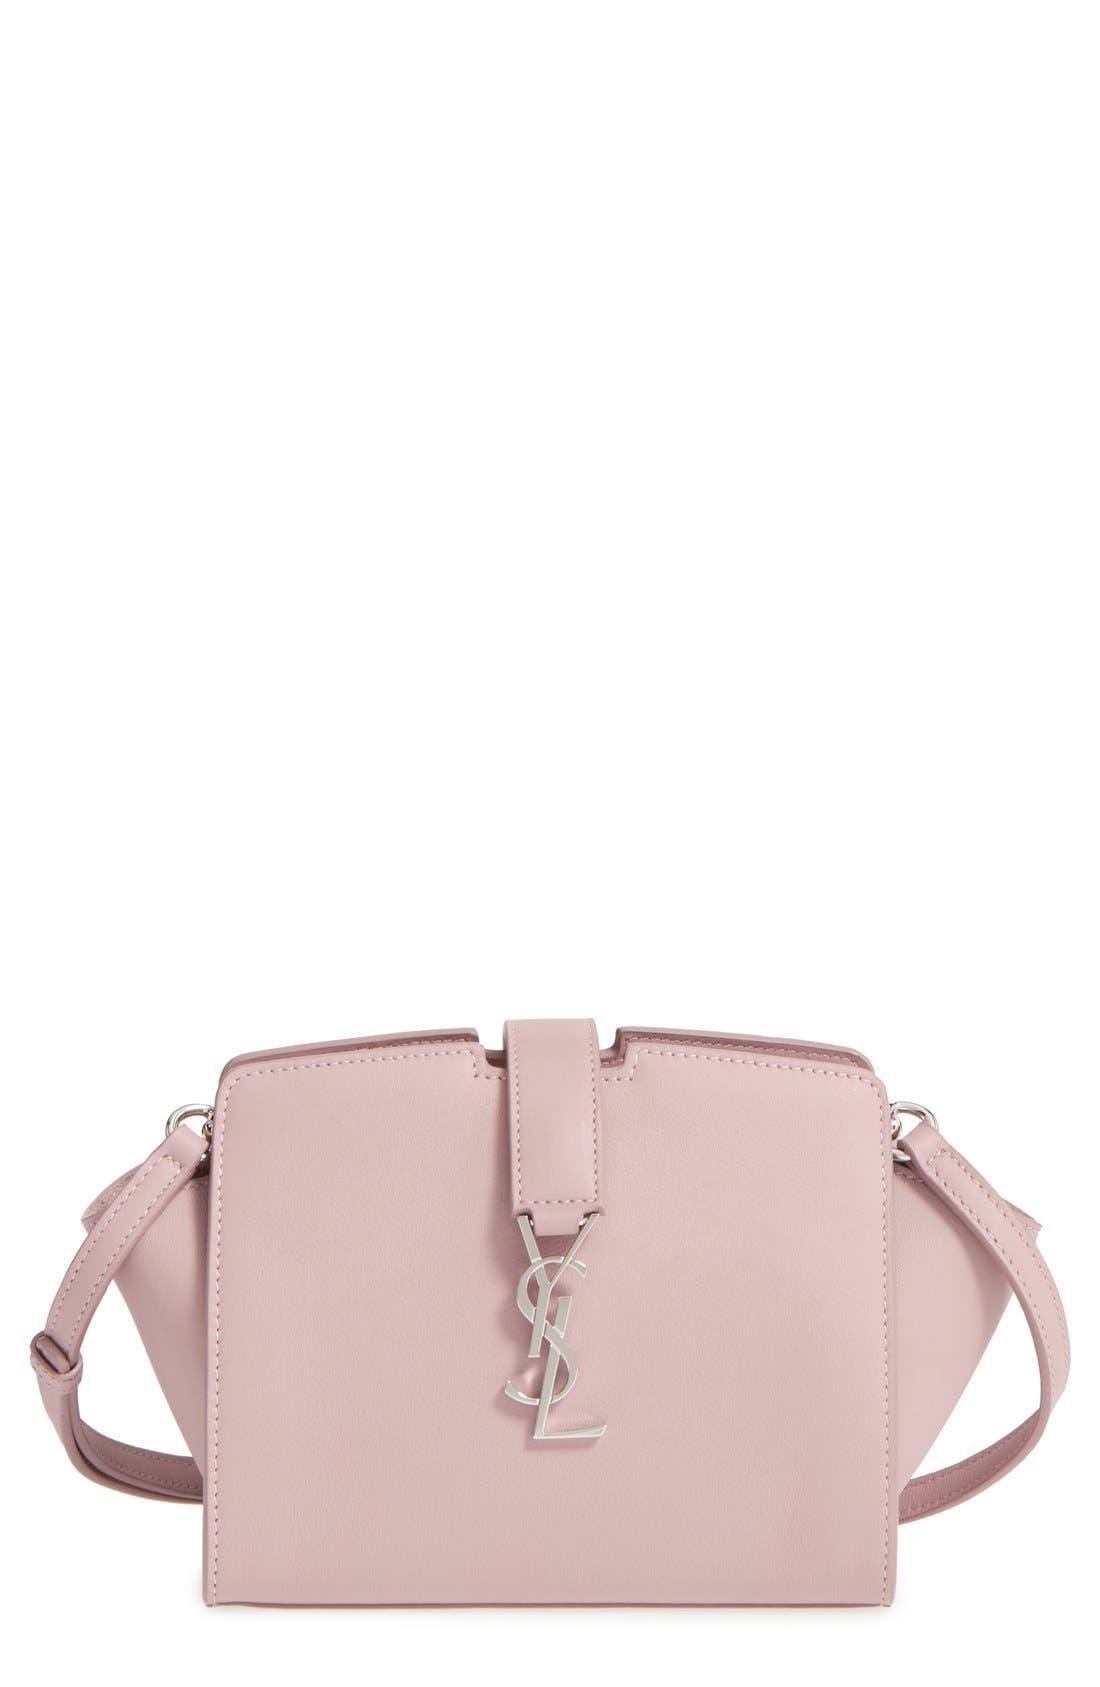 Alternate Image 1 Selected - Saint Laurent Toy Cabas Leather Crossbody Bag